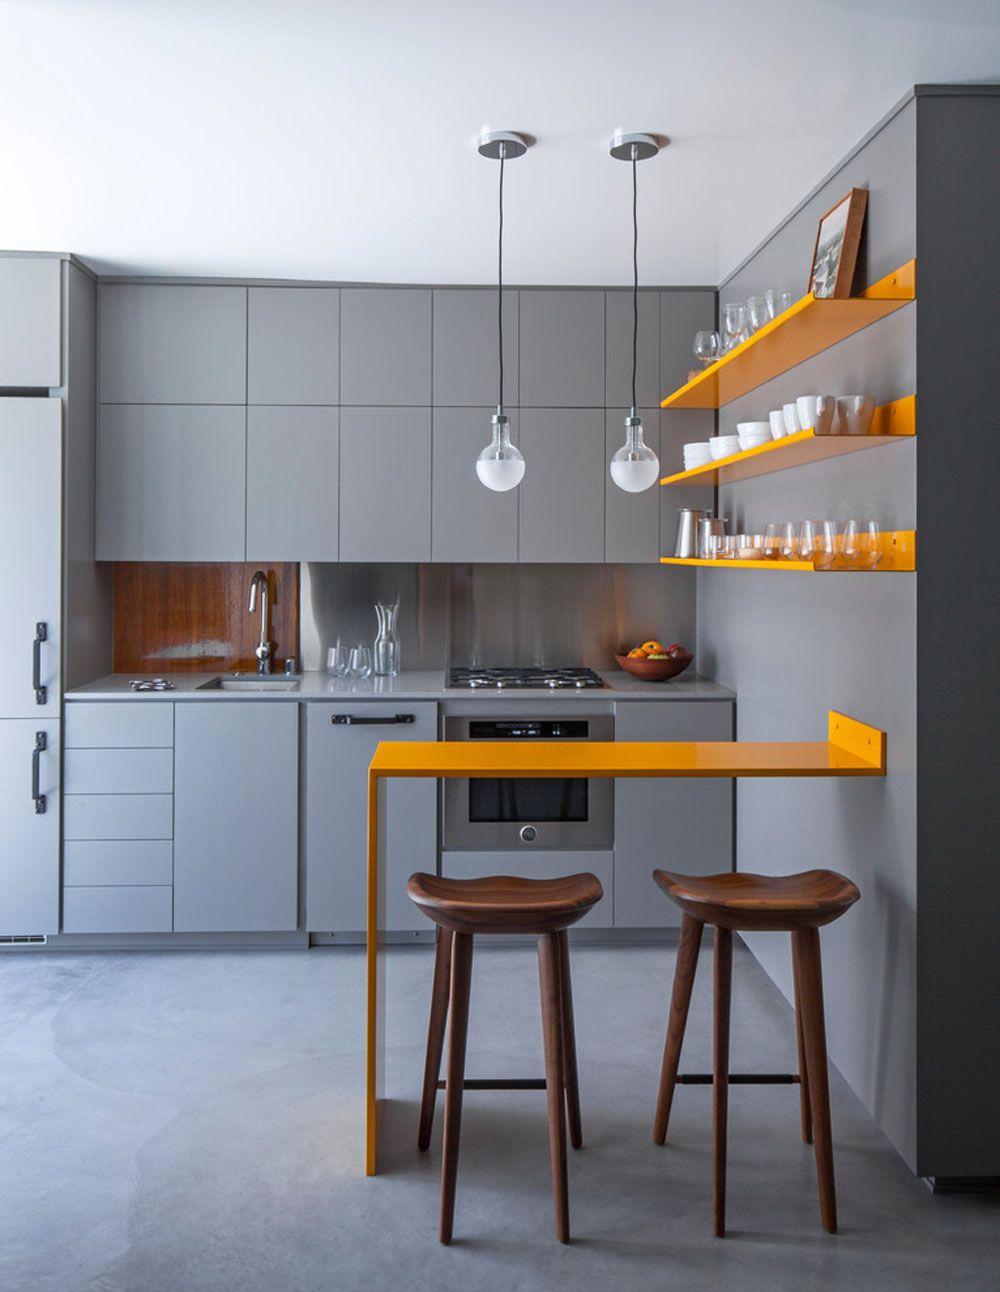 Mikro Apartments Deko Ideen Um Ihren Kleinen Raum Fuhlen Sich Grosse Mobelideen Com Simple Kitchen Design Tiny House Kitchen Kitchen Design Small